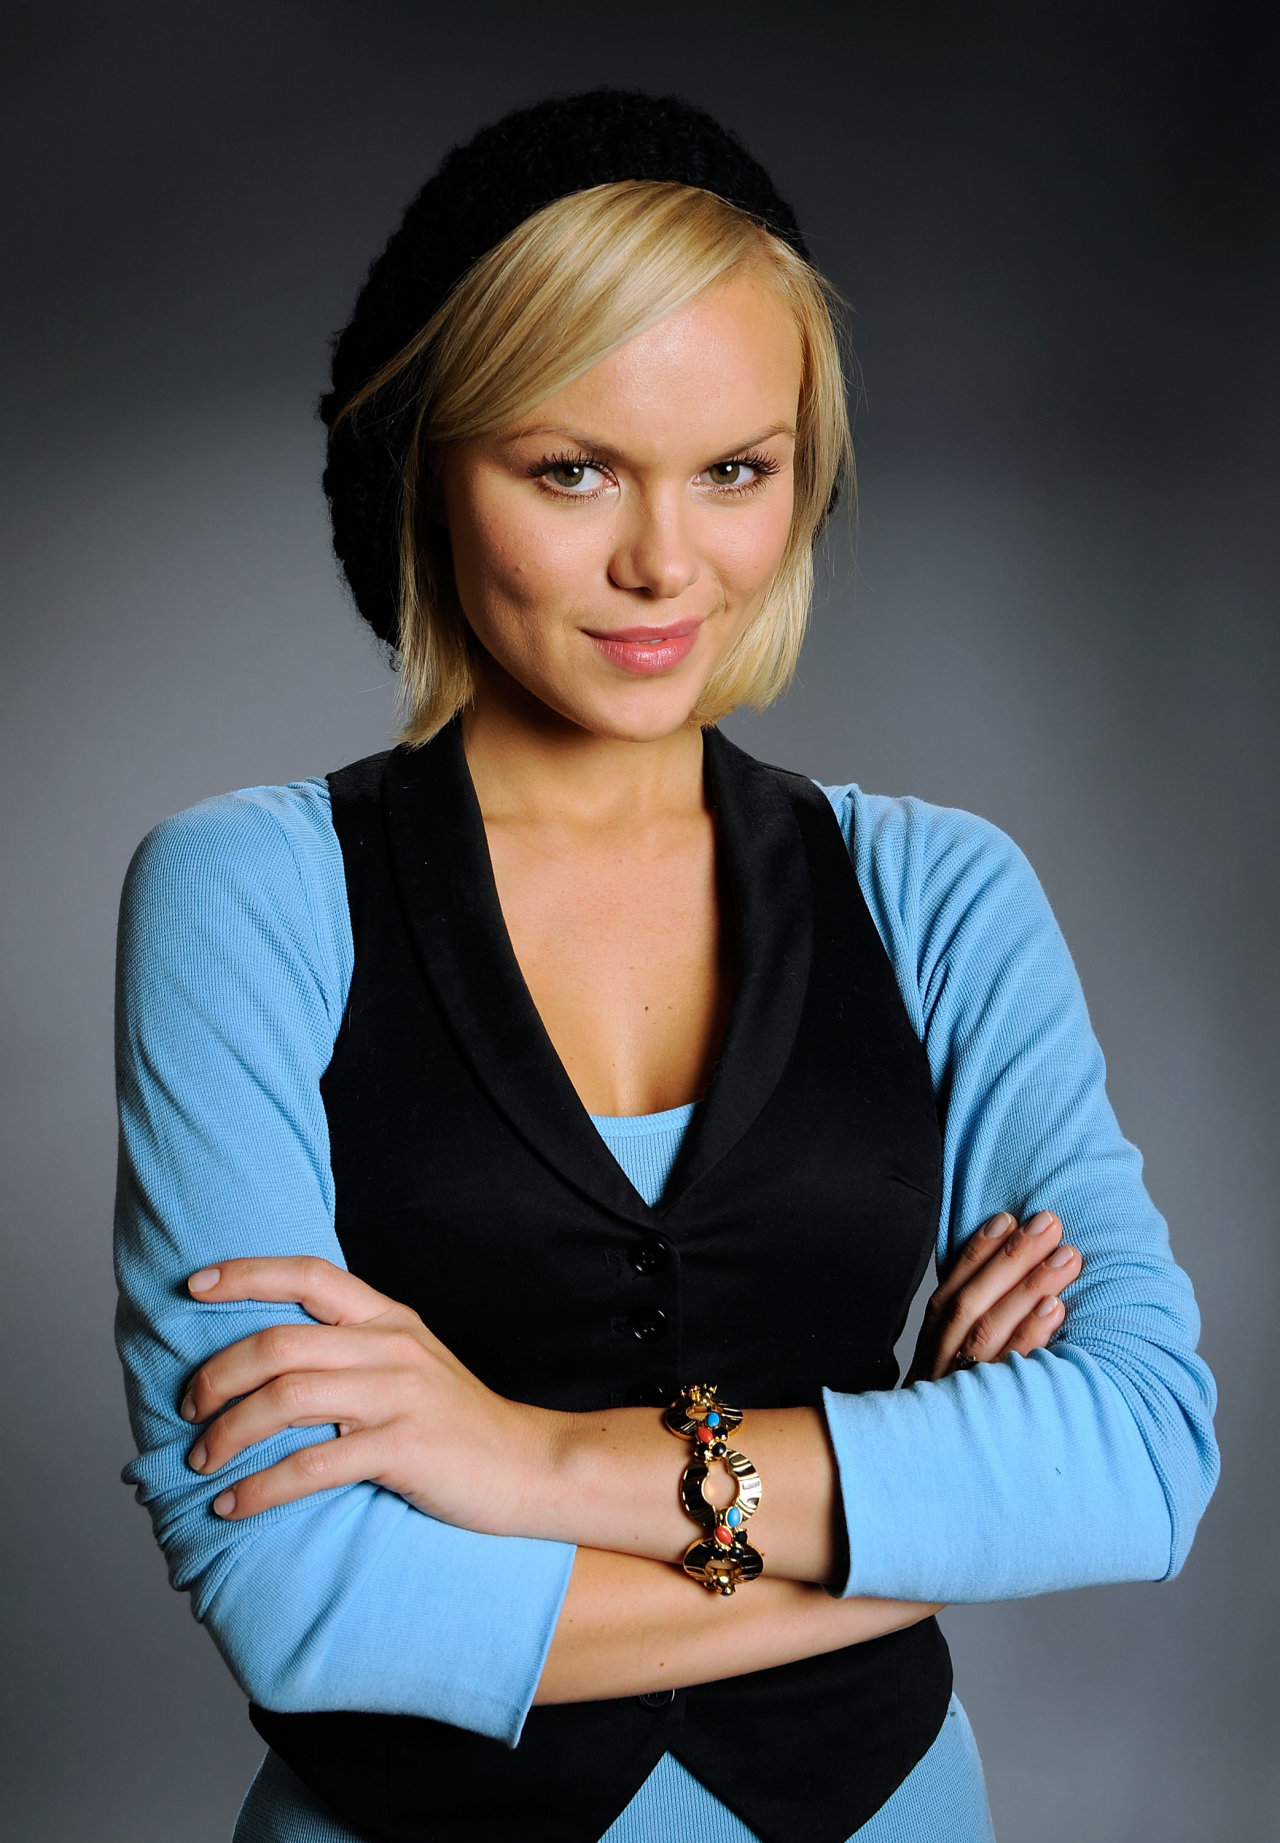 Anya Monzikova